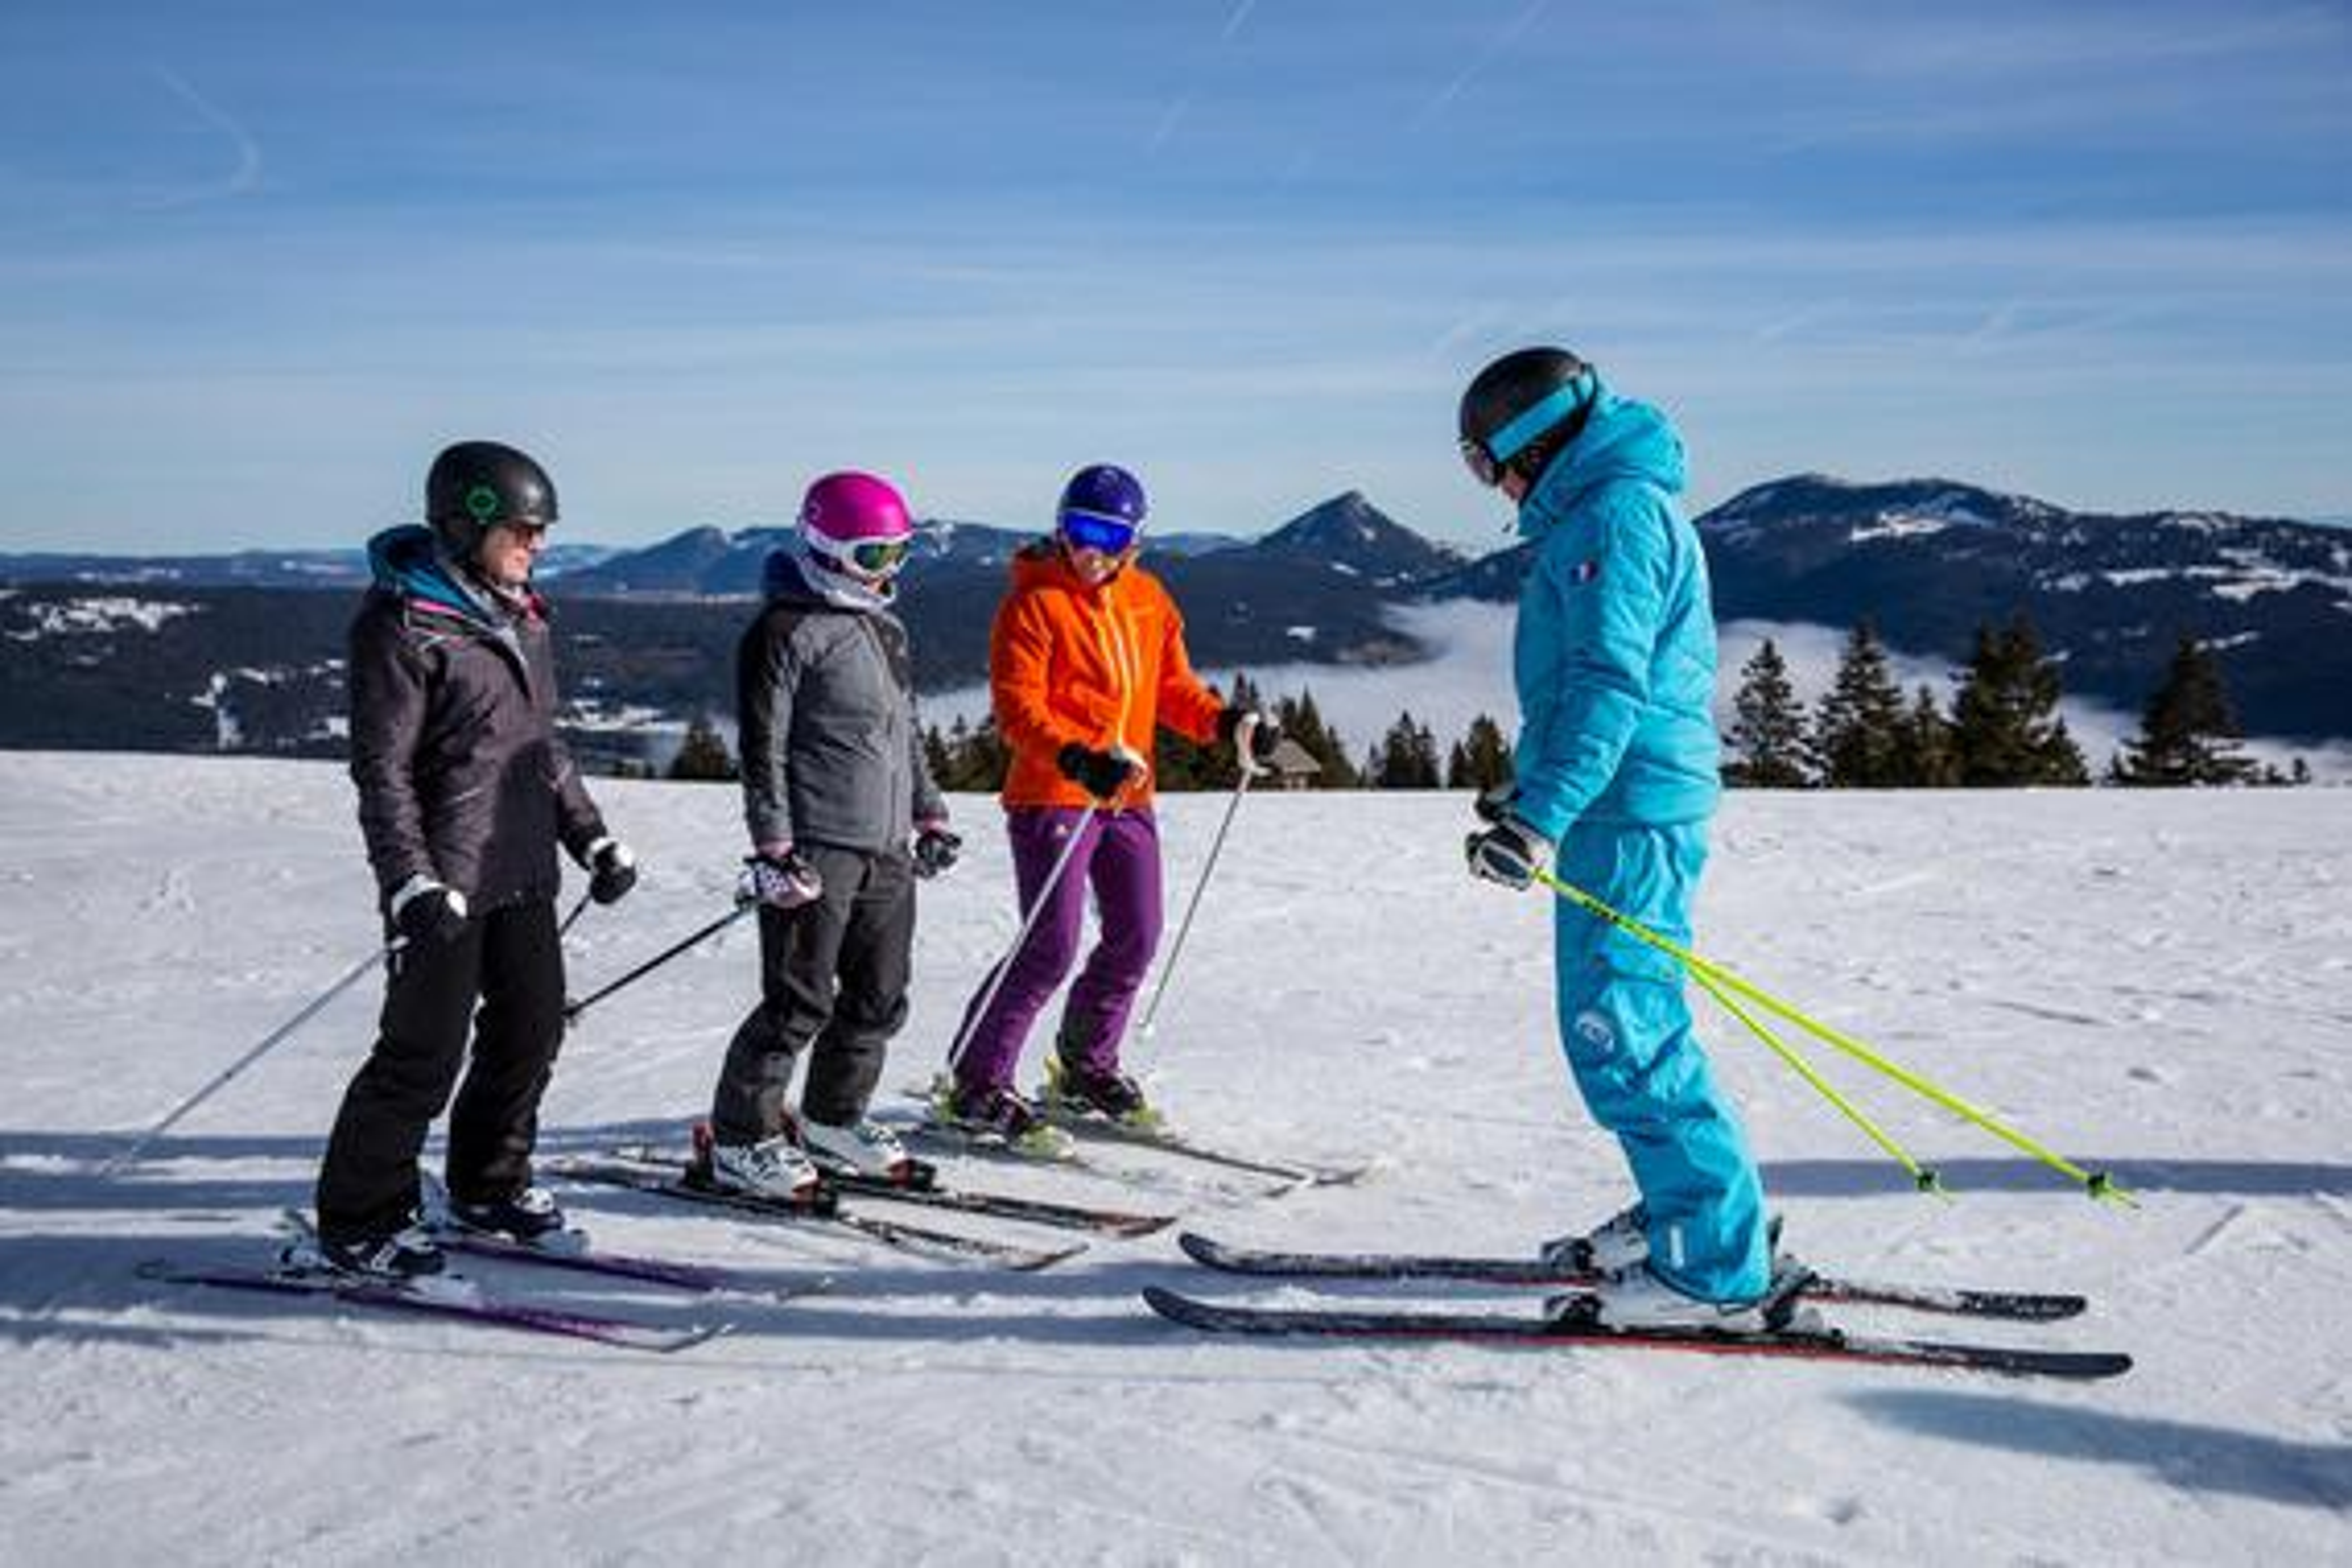 Ski Lessons for Teens & Adults - Low Season - Advanced